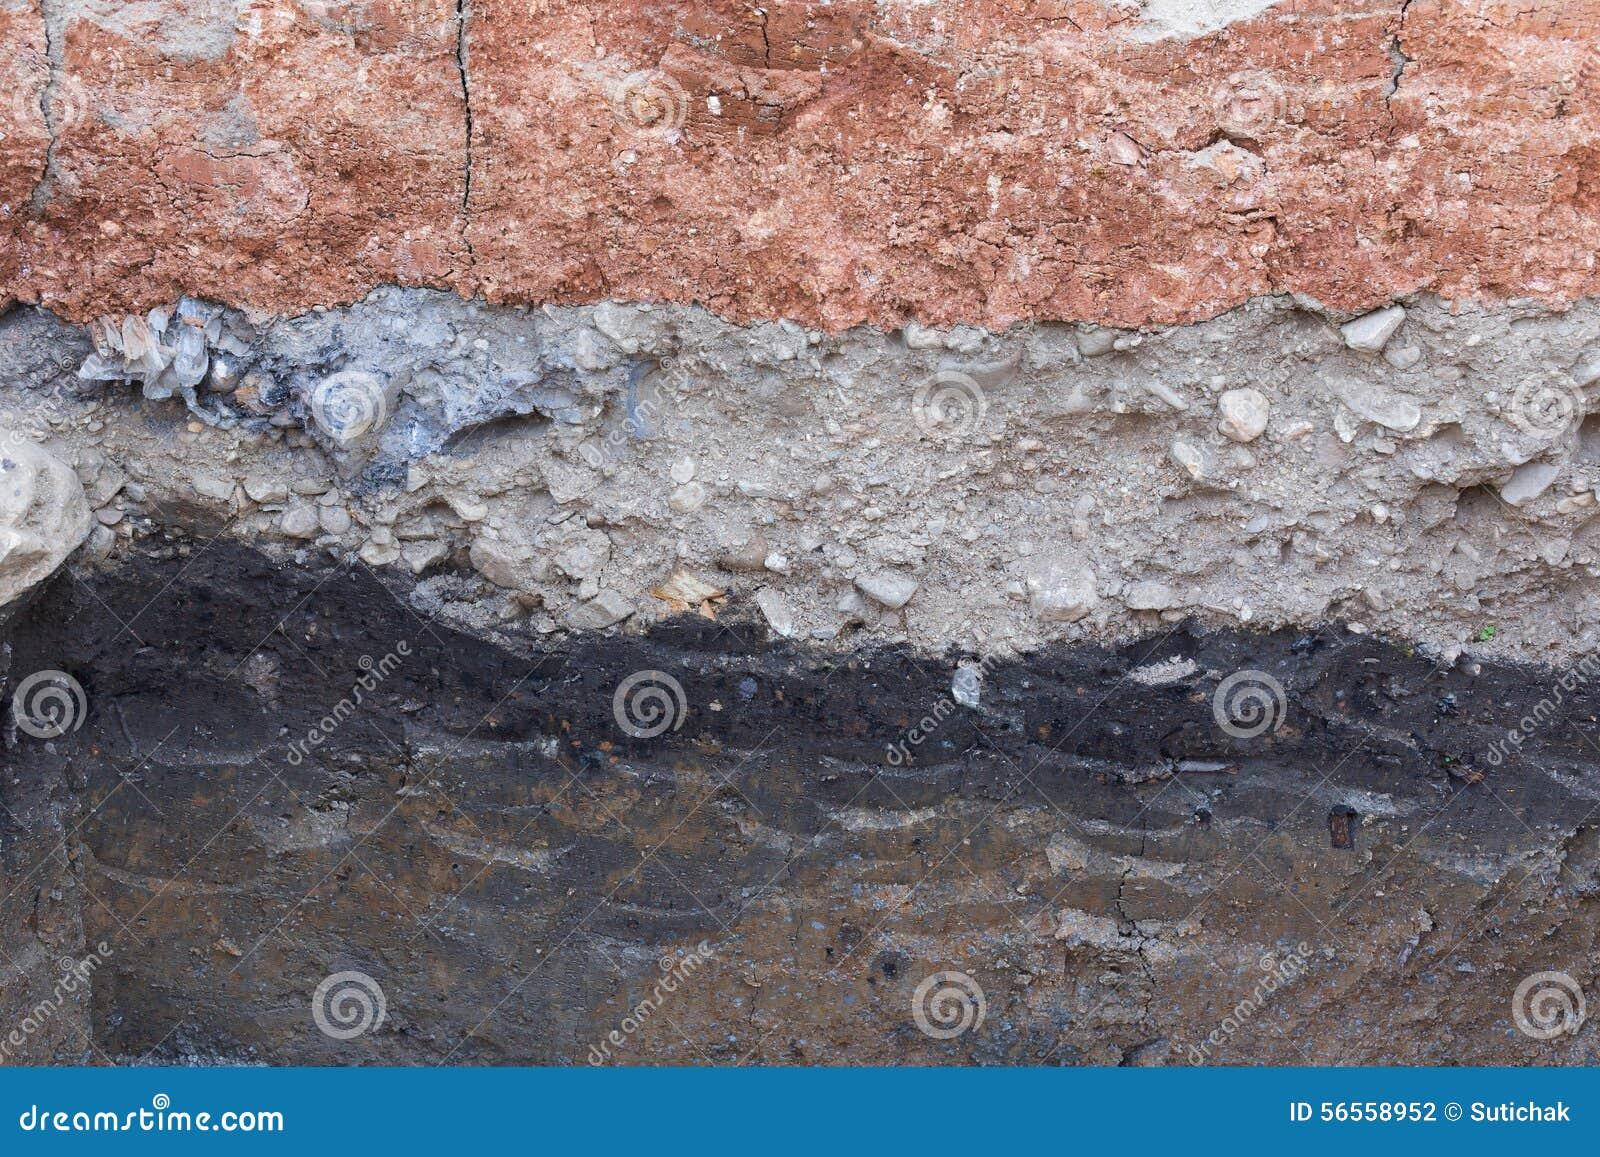 Download Εδαφολογικά στρώματα στην υπόγεια γη της επιστήμης Στοκ Εικόνες - εικόνα από βιομηχανικός, αδελφών: 56558952